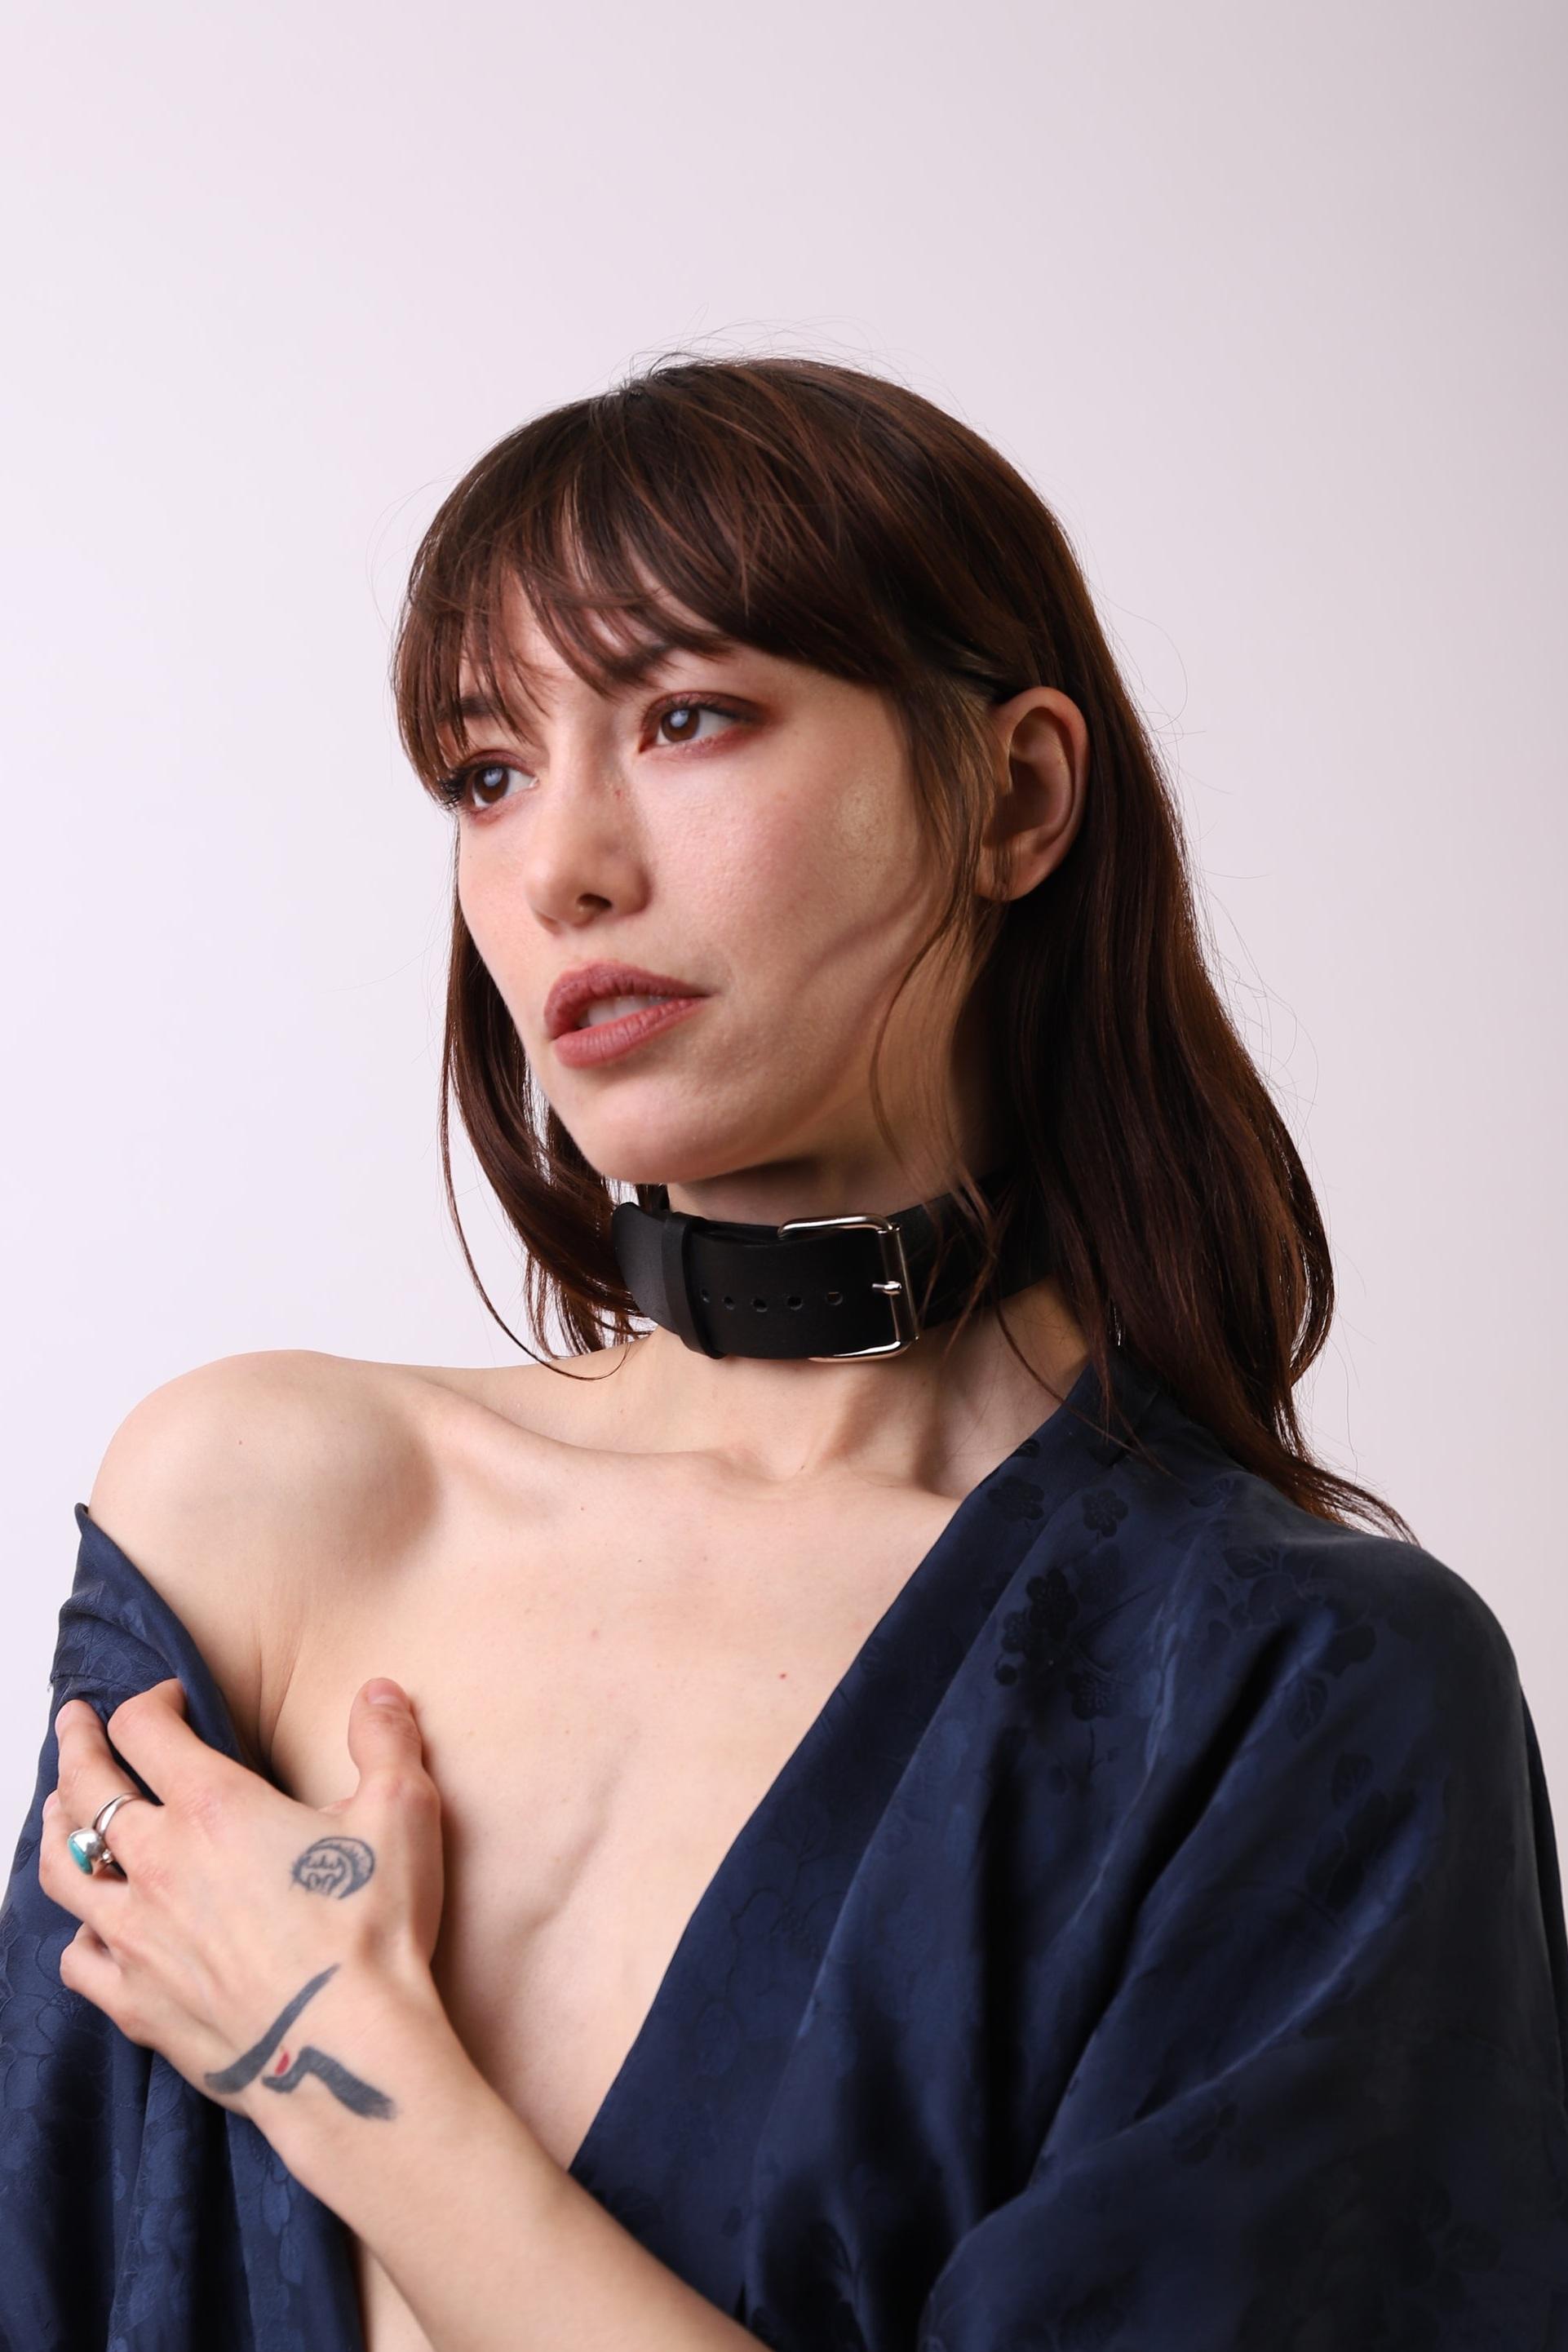 Emma collar